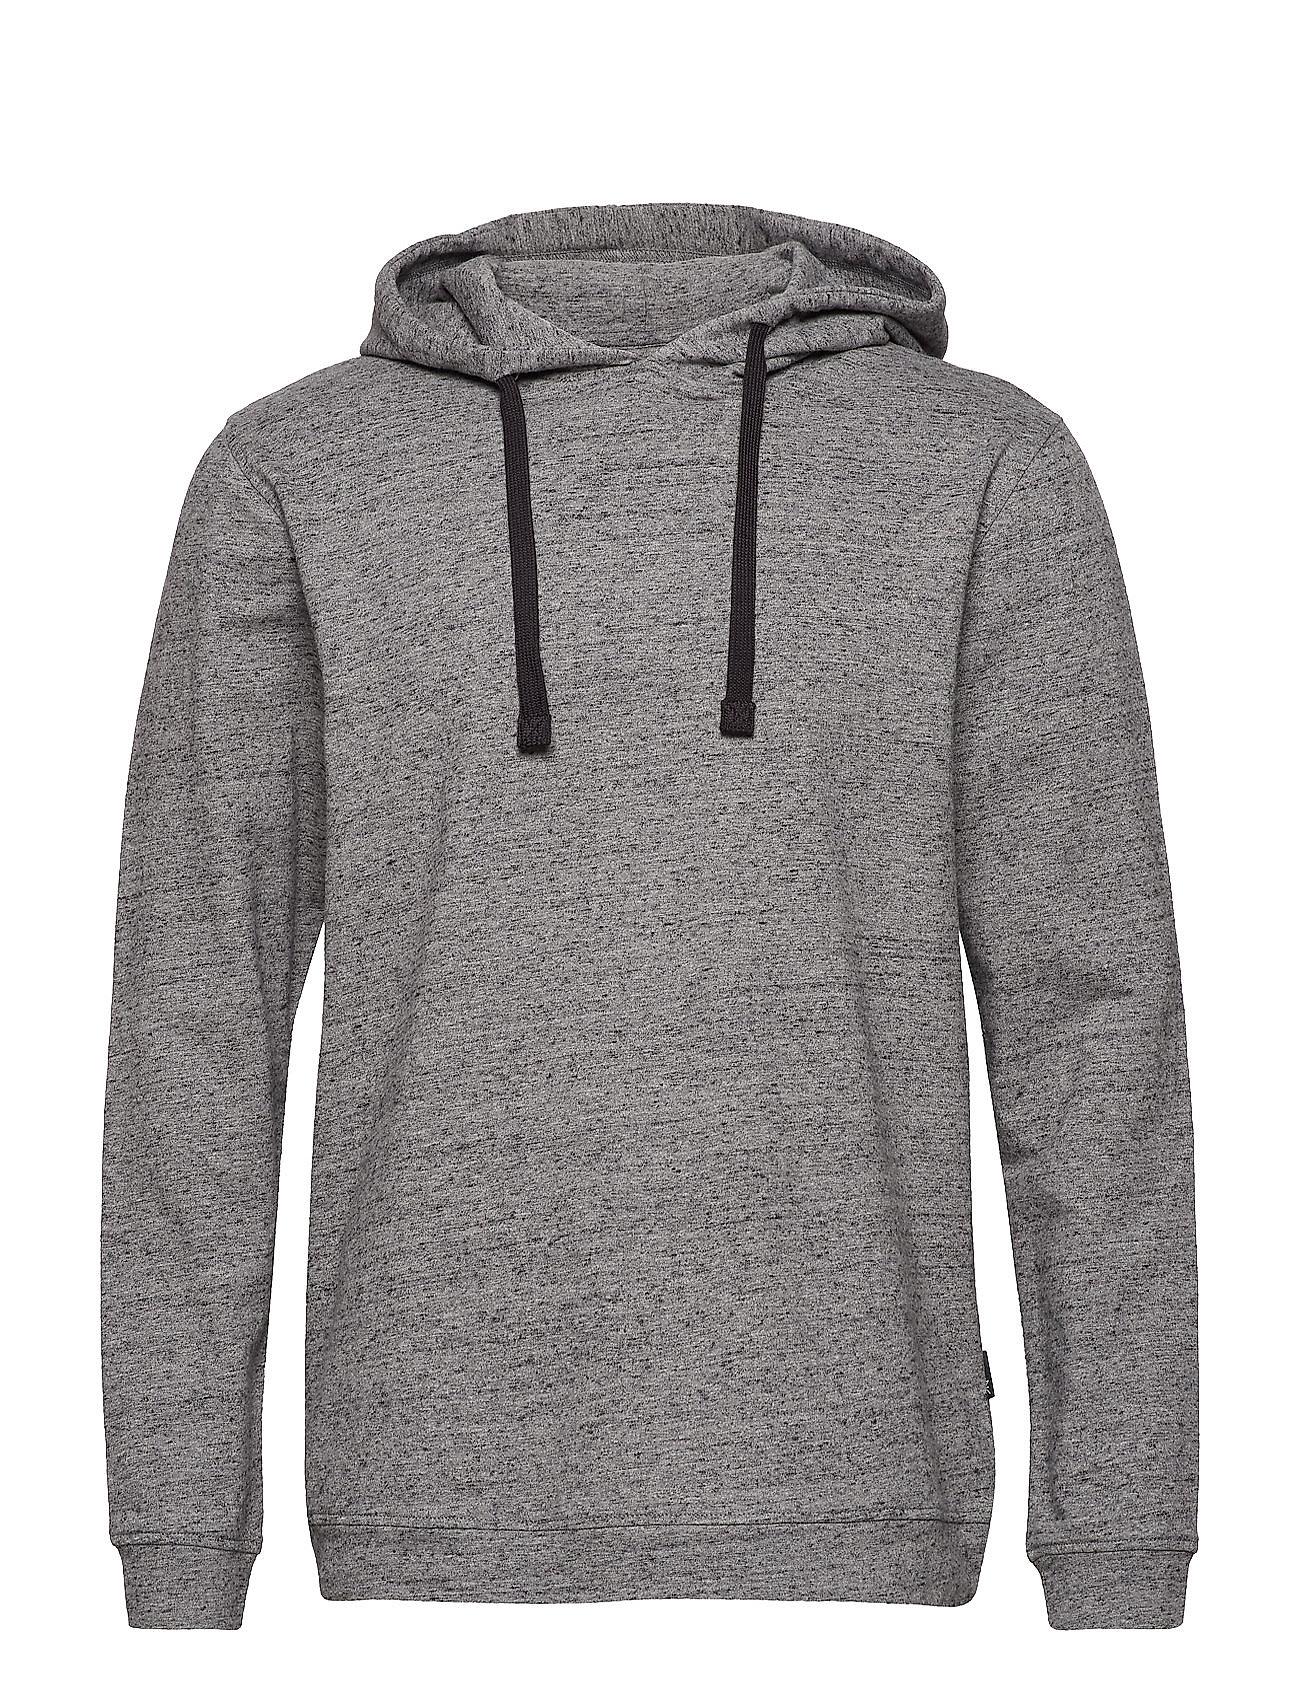 JBS of Denmark JBS of Denmark, sweat hoodie - GREY MELAN